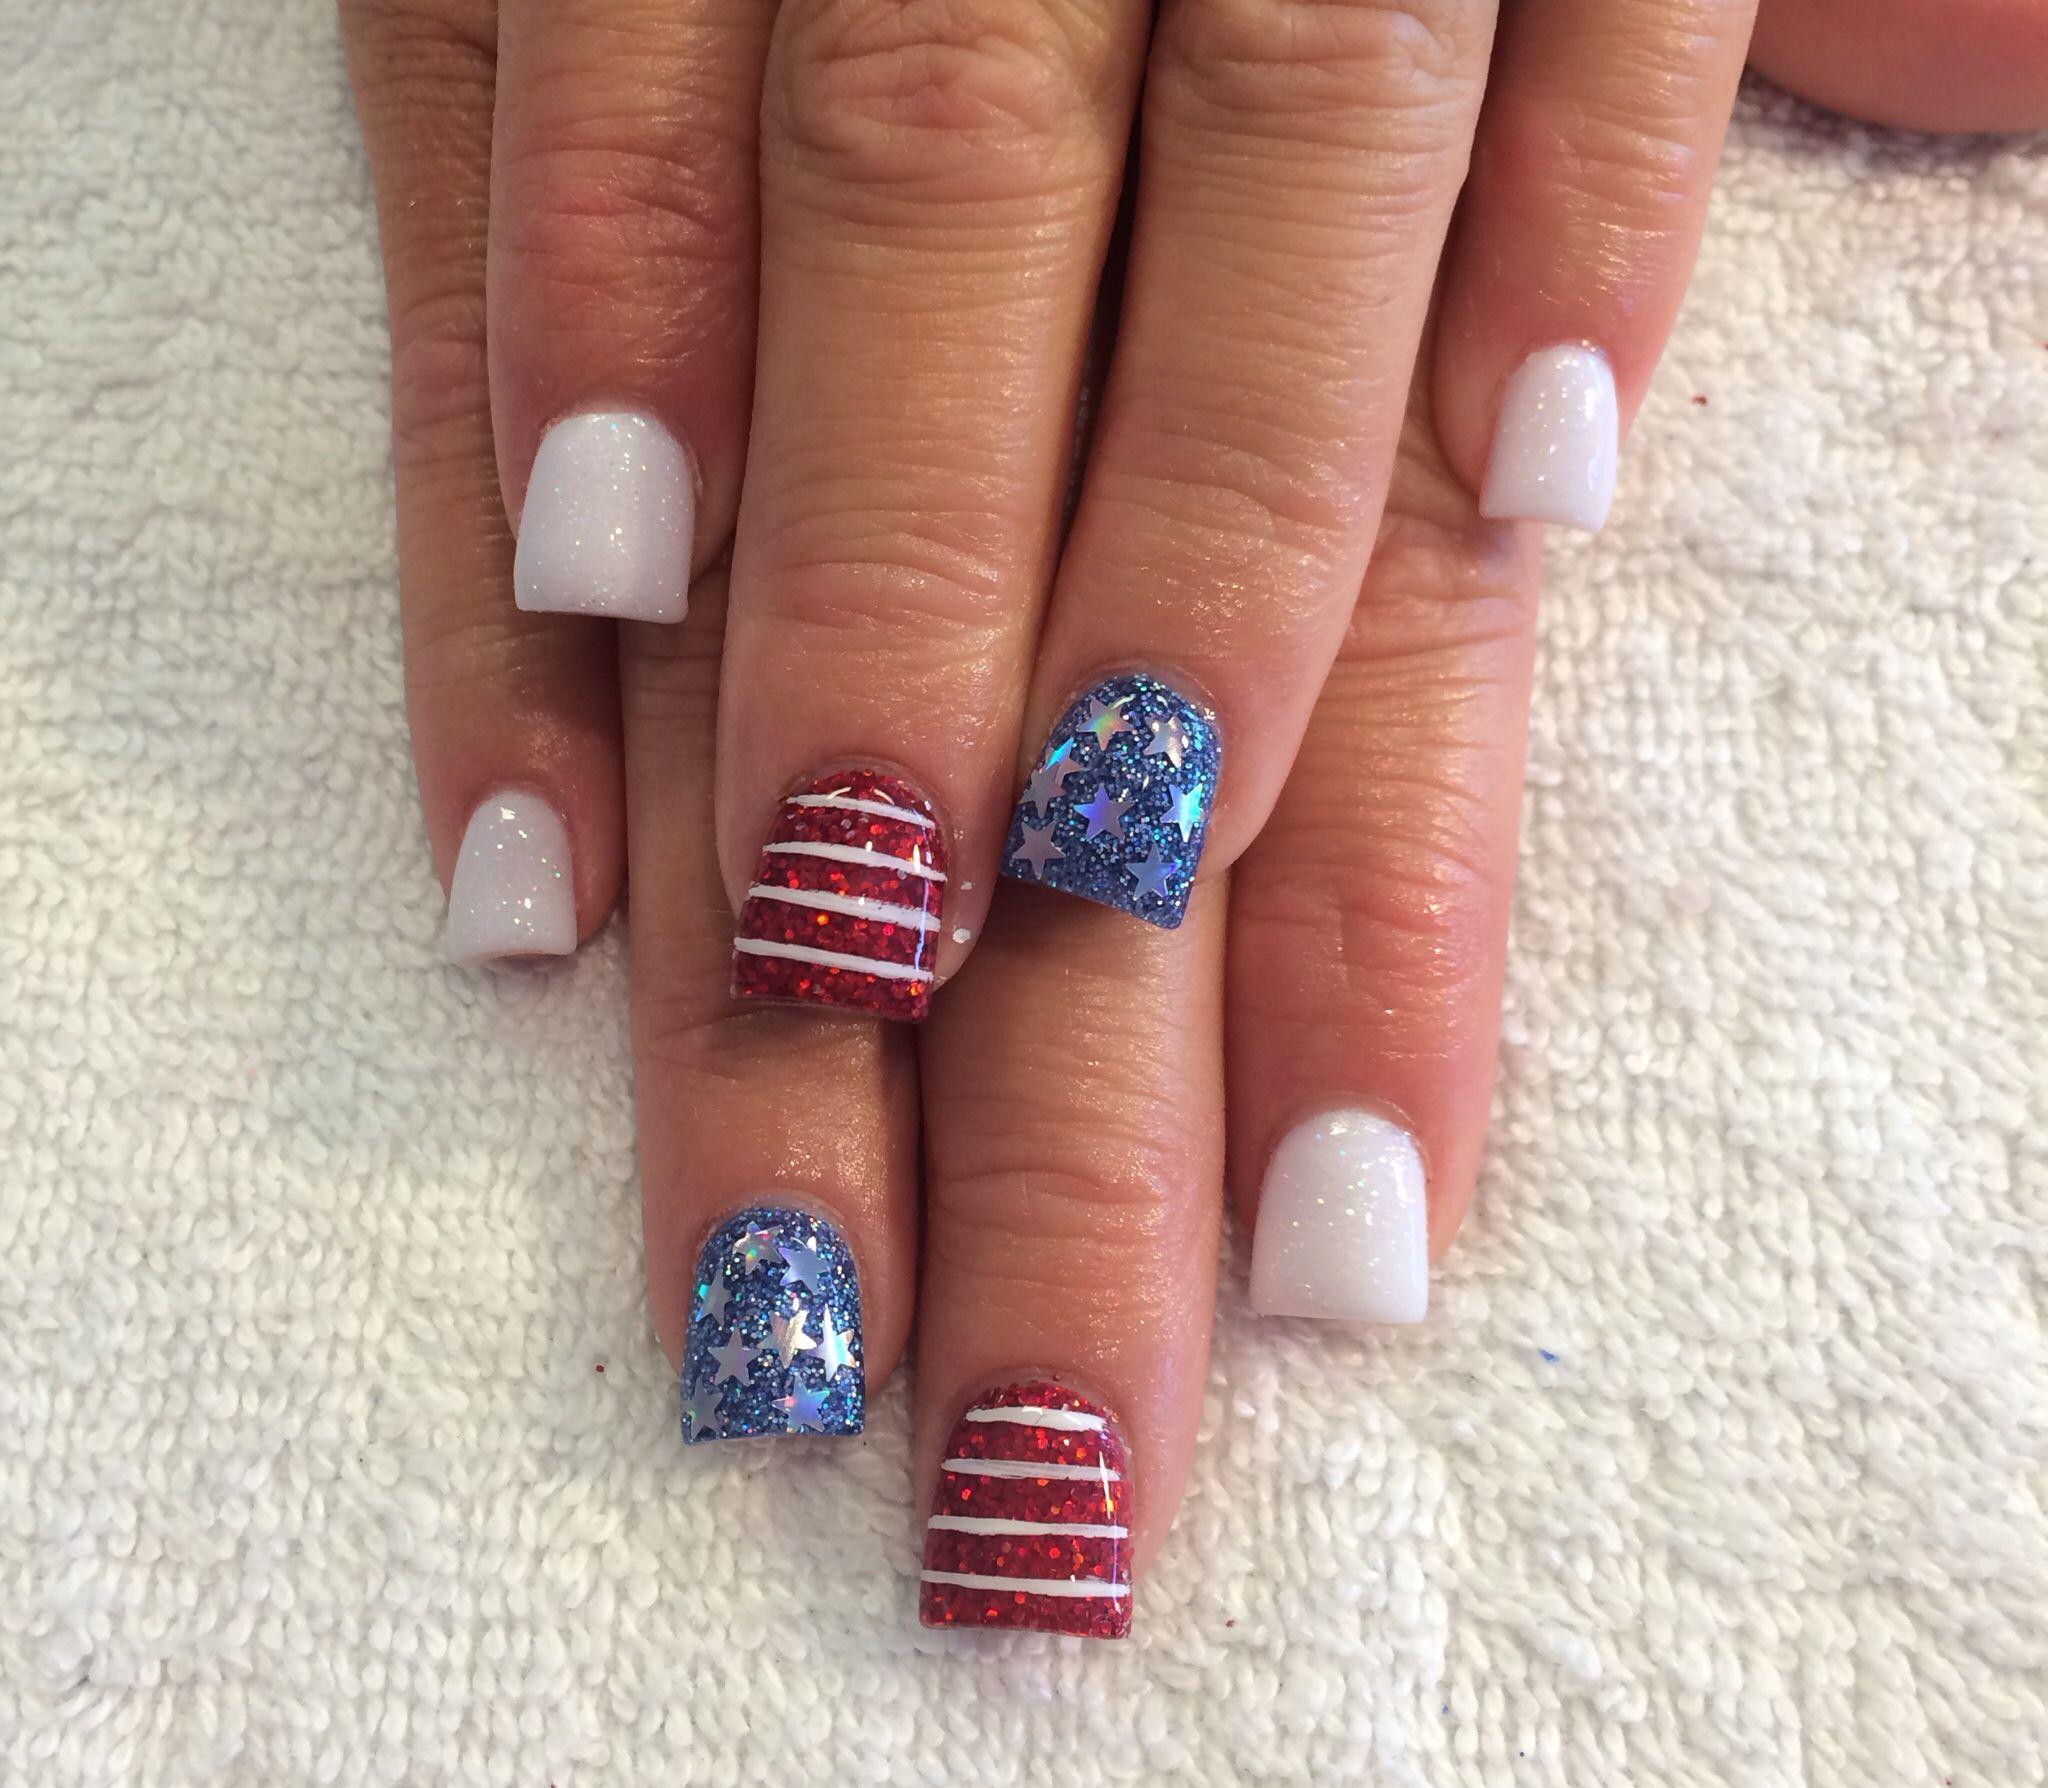 Patriotic Nails 4th Of July Acrylic Starsandstripes Glitter Salon Pure Beauty Sandy Ut July Nails Toe Nail Designs Nails